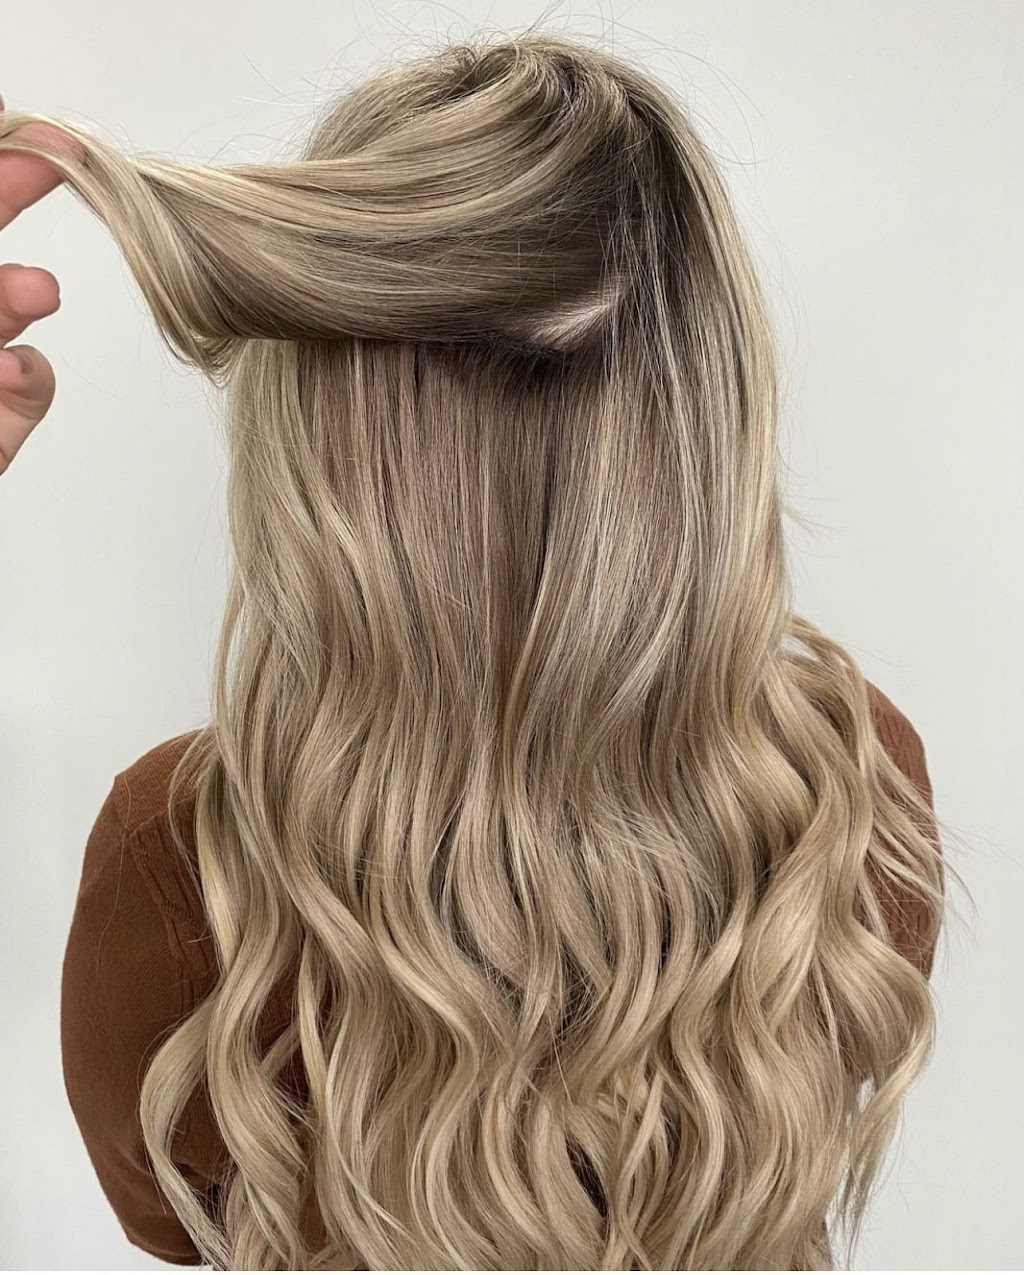 Evolve Simply Beauty - hair care    Photo 2 of 10   Address: 4590 N Maize Rd #8, Maize, KS 67101, USA   Phone: (316) 927-2400